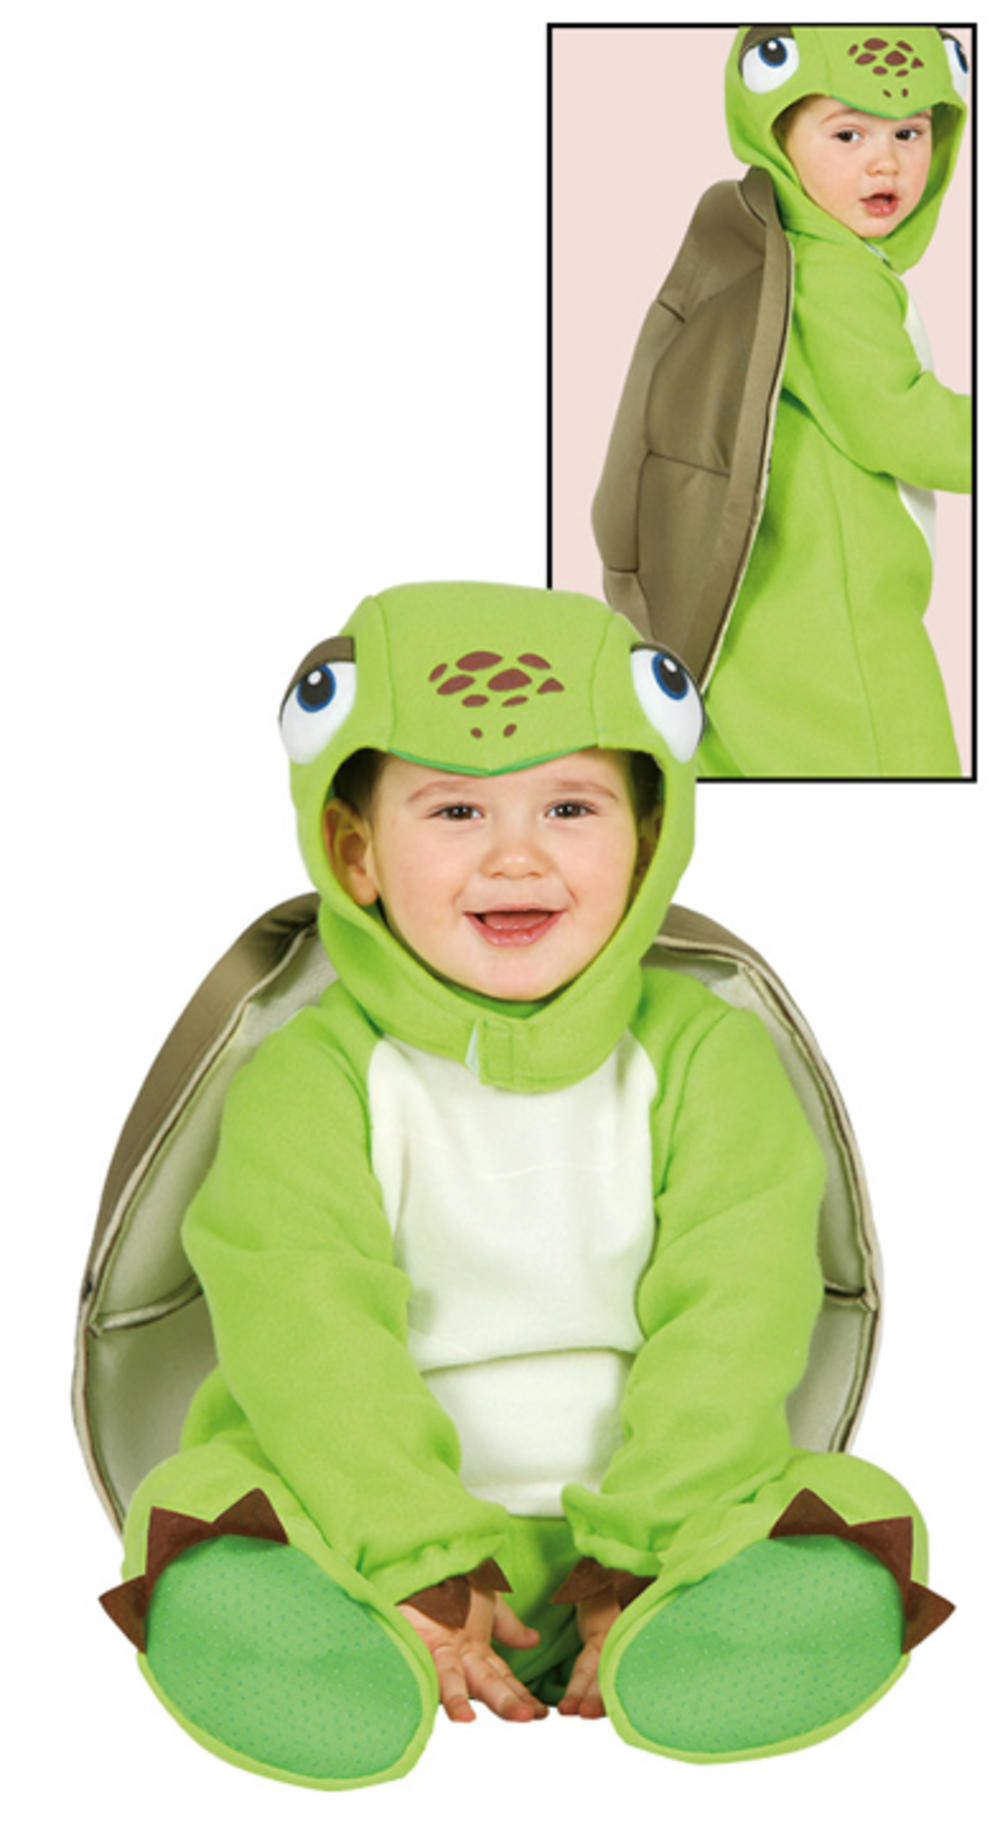 Tortoise Baby Fancy Dress Storybook Animal Turtle Boys Girls Toddler Costume New